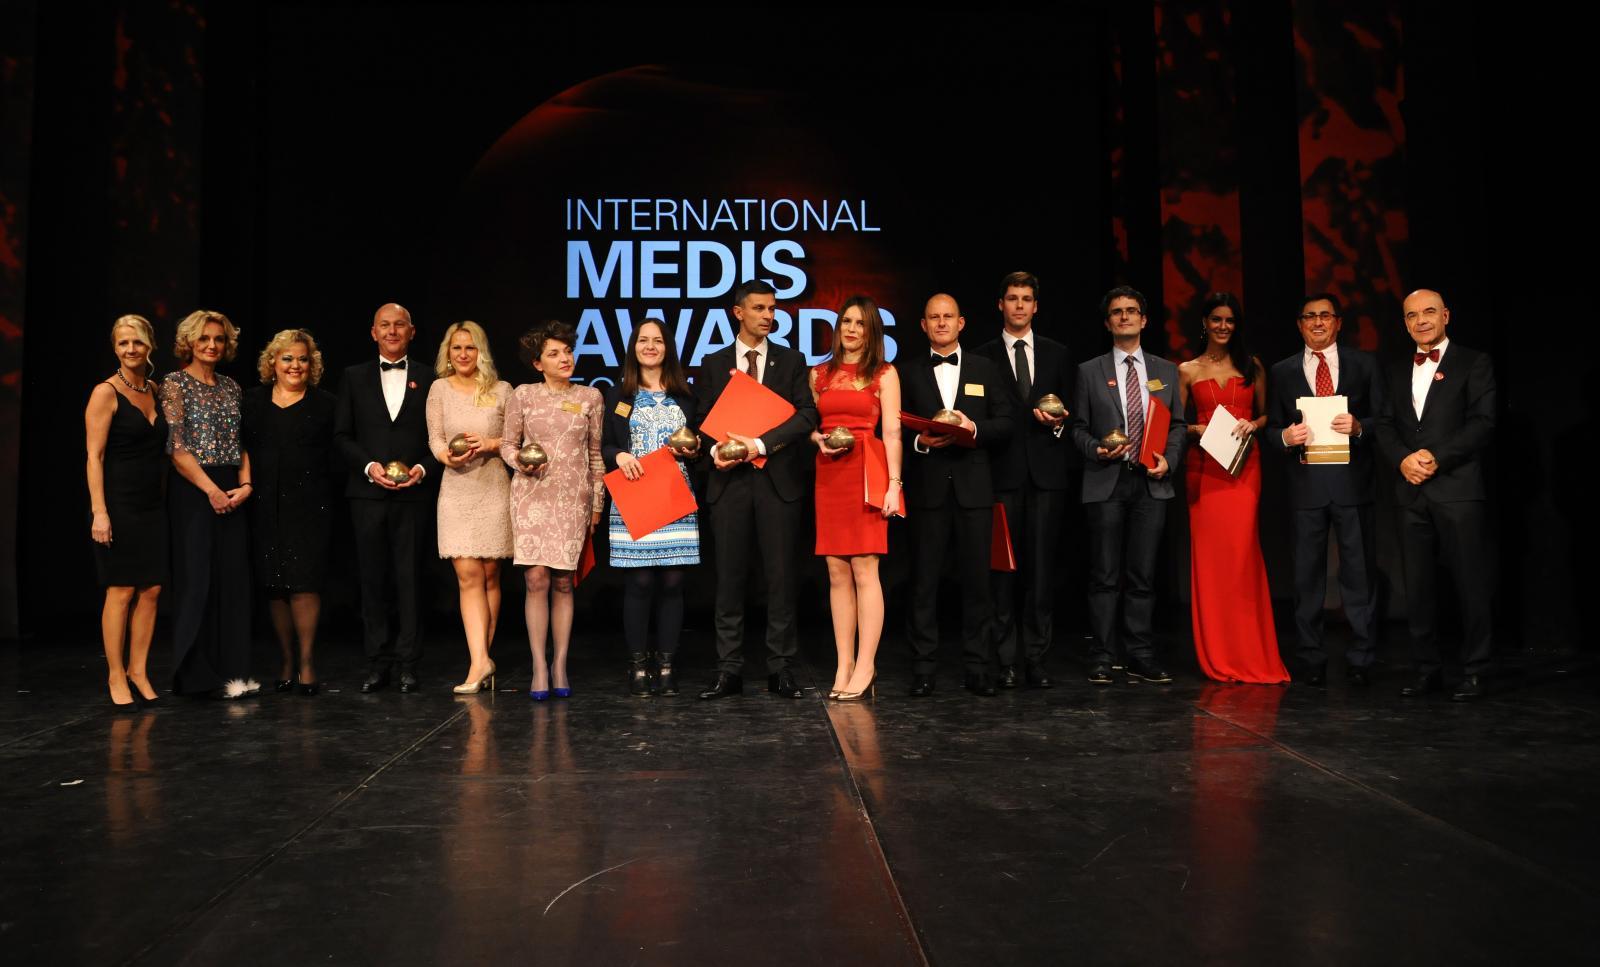 Dobitnici nagrada: prof. dr. Matija Tomšič, dr. Veronika Rutar Gorišek, dr. Jelena Vojinović, dr. Mladena Lalić-Popović, dr. Tihamer Molnar, dr. Marina Labor, dr. Aleksej Medić, dr. Mattias Mandorfer te dr. Ivan Padjen.